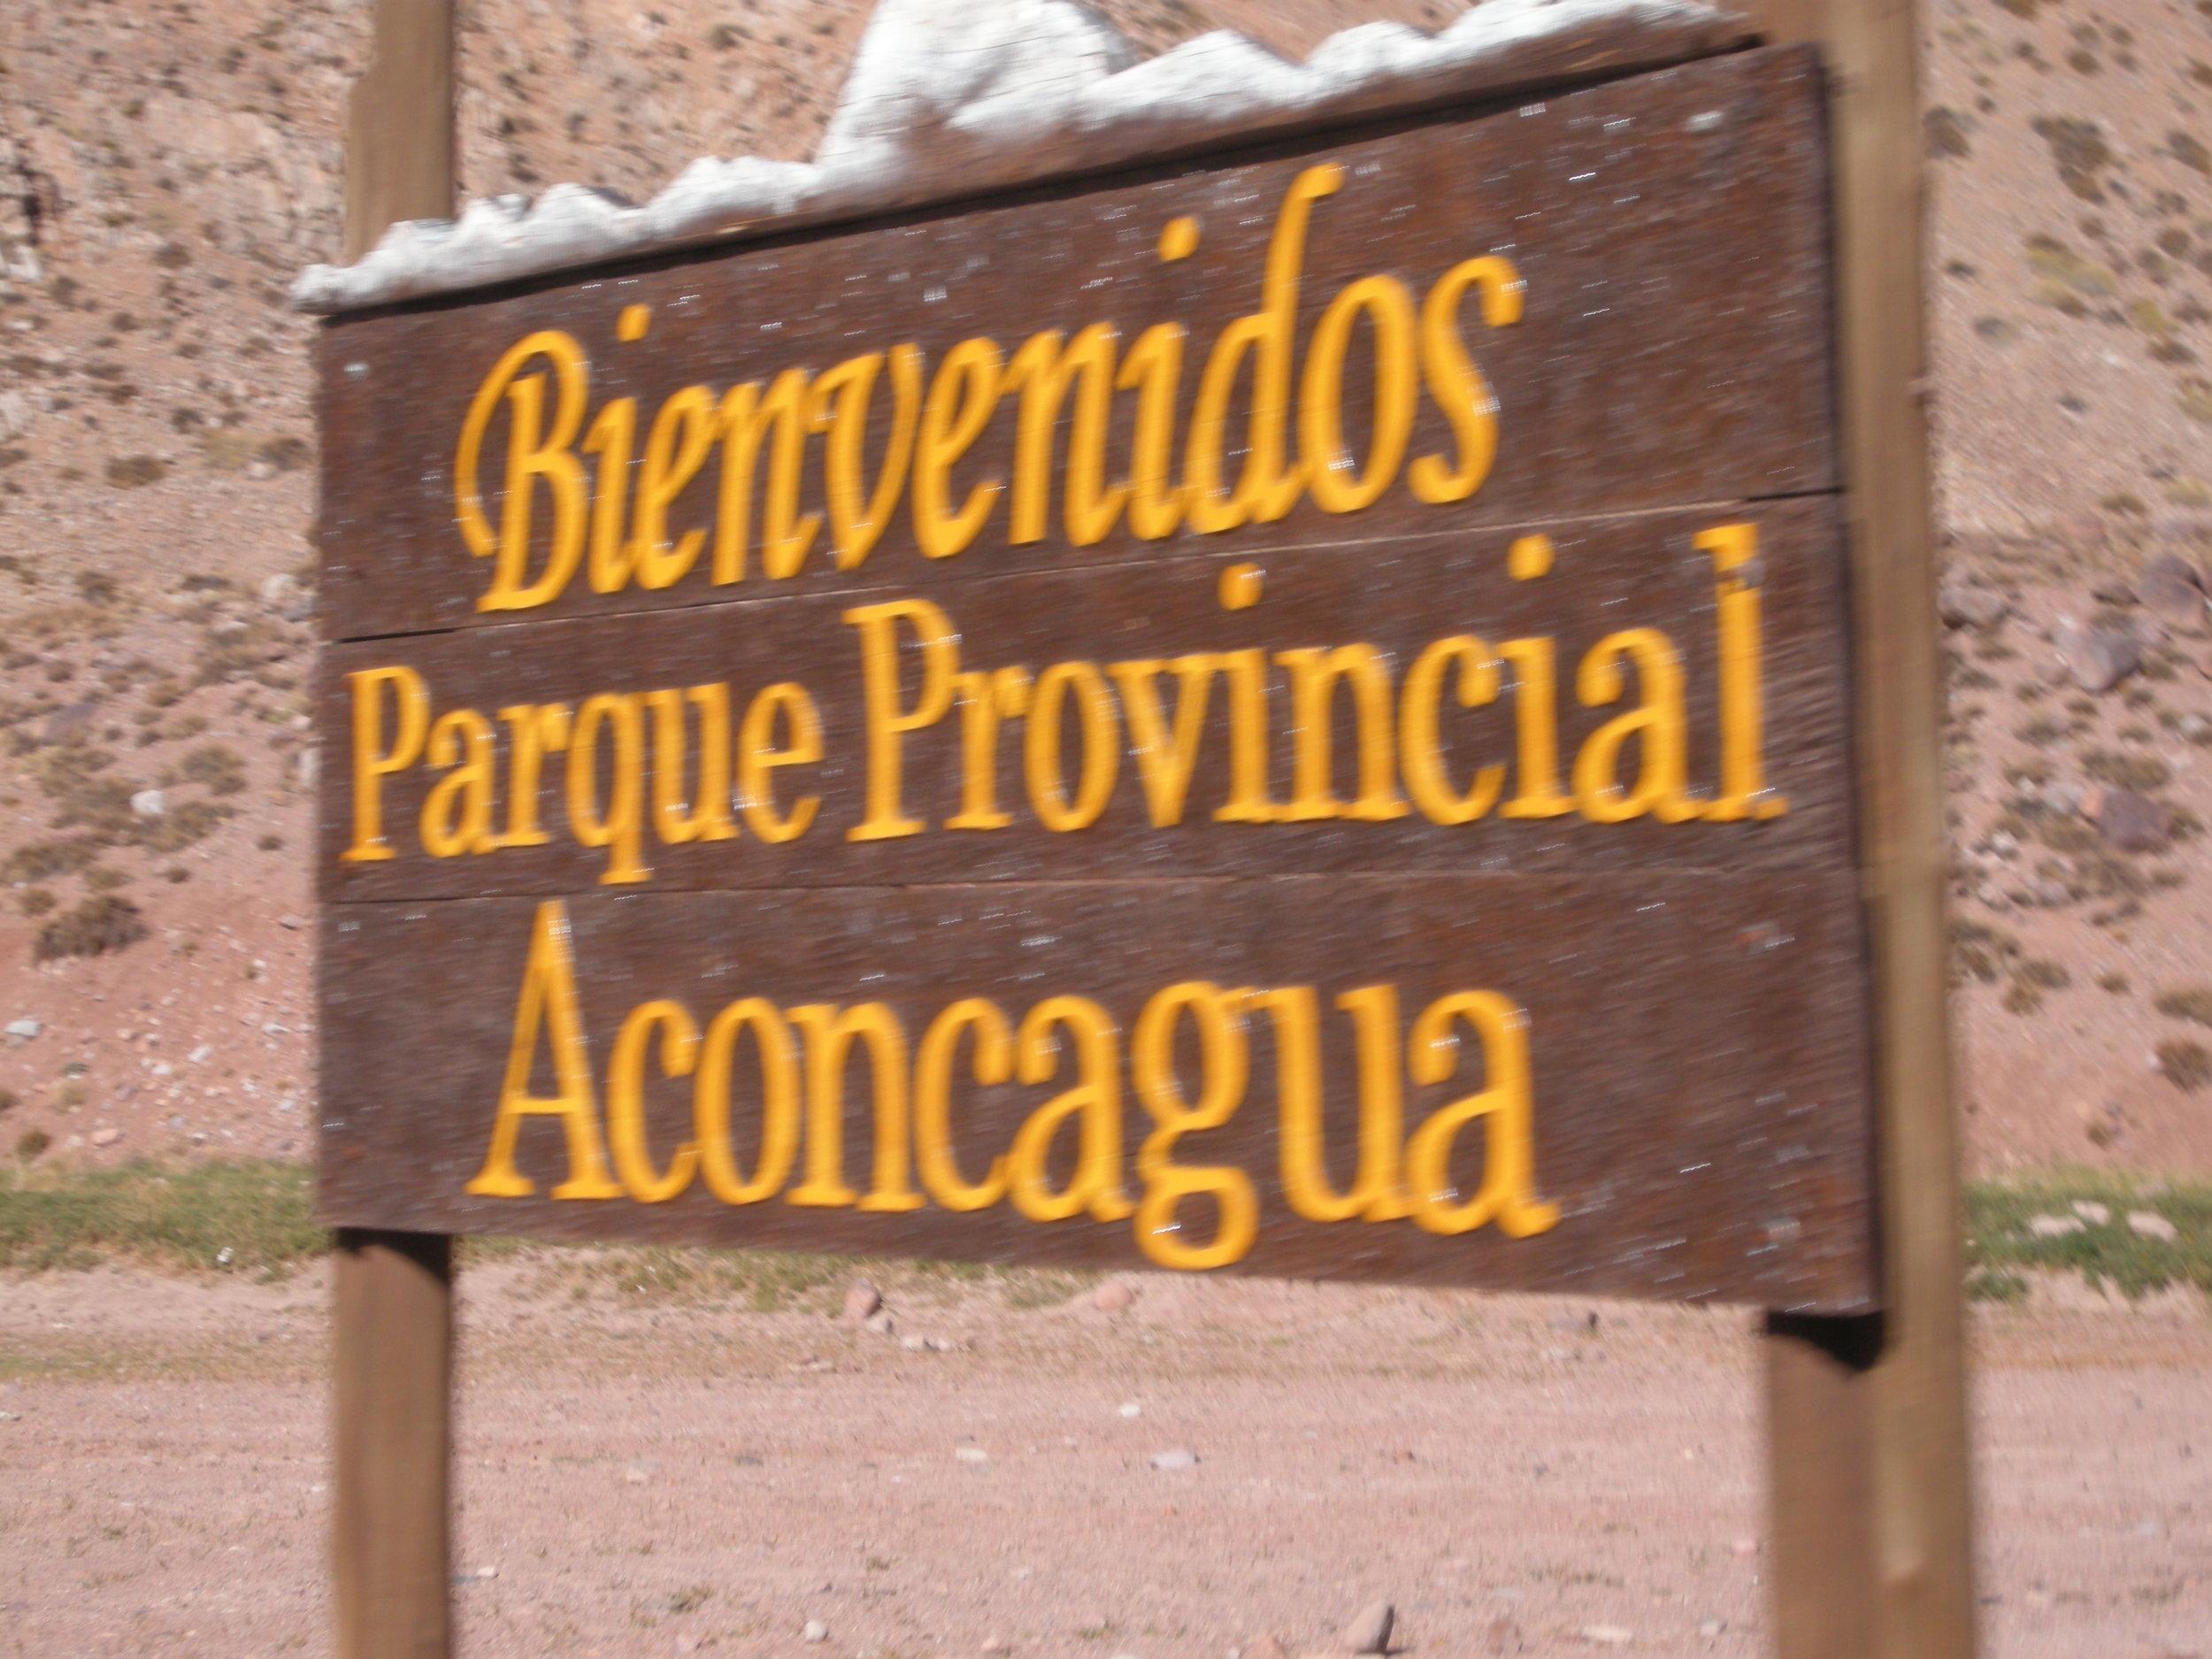 Aconcagua 044.jpg